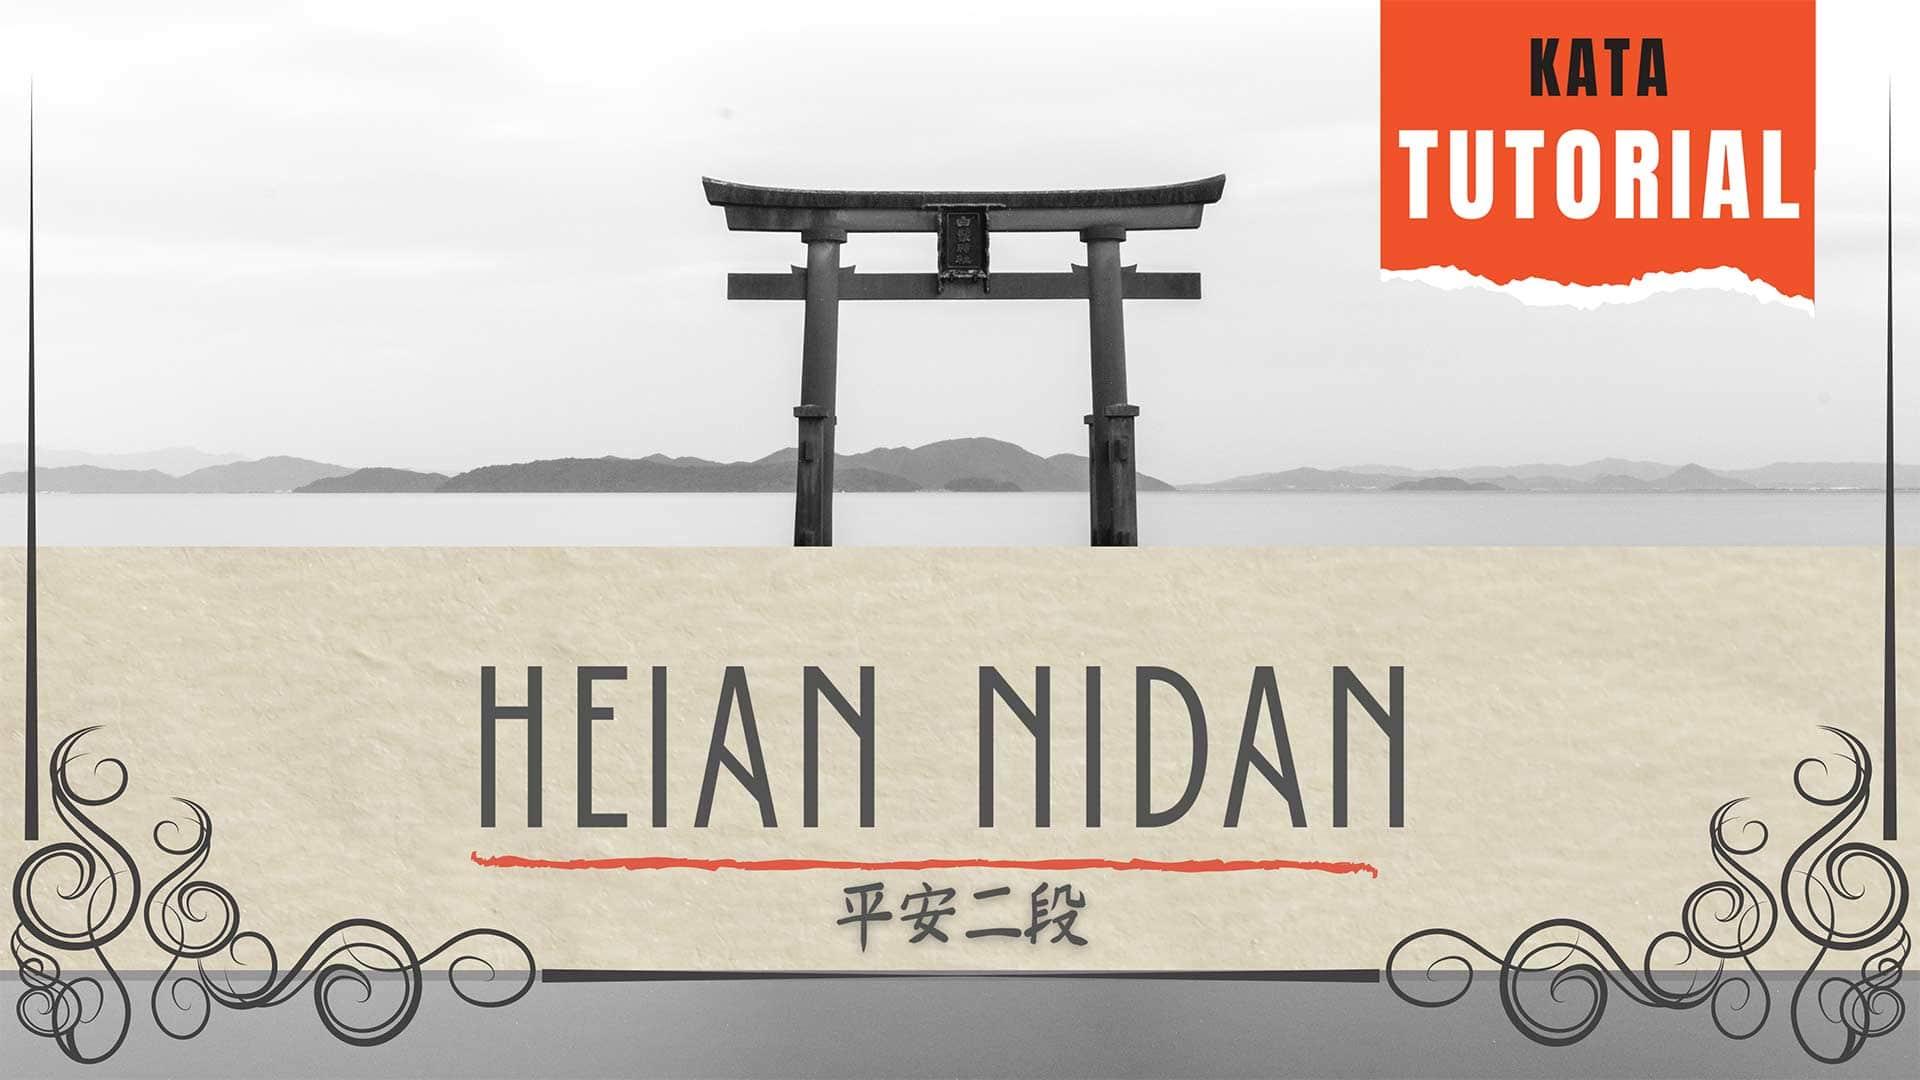 heian nidan kata tutorial